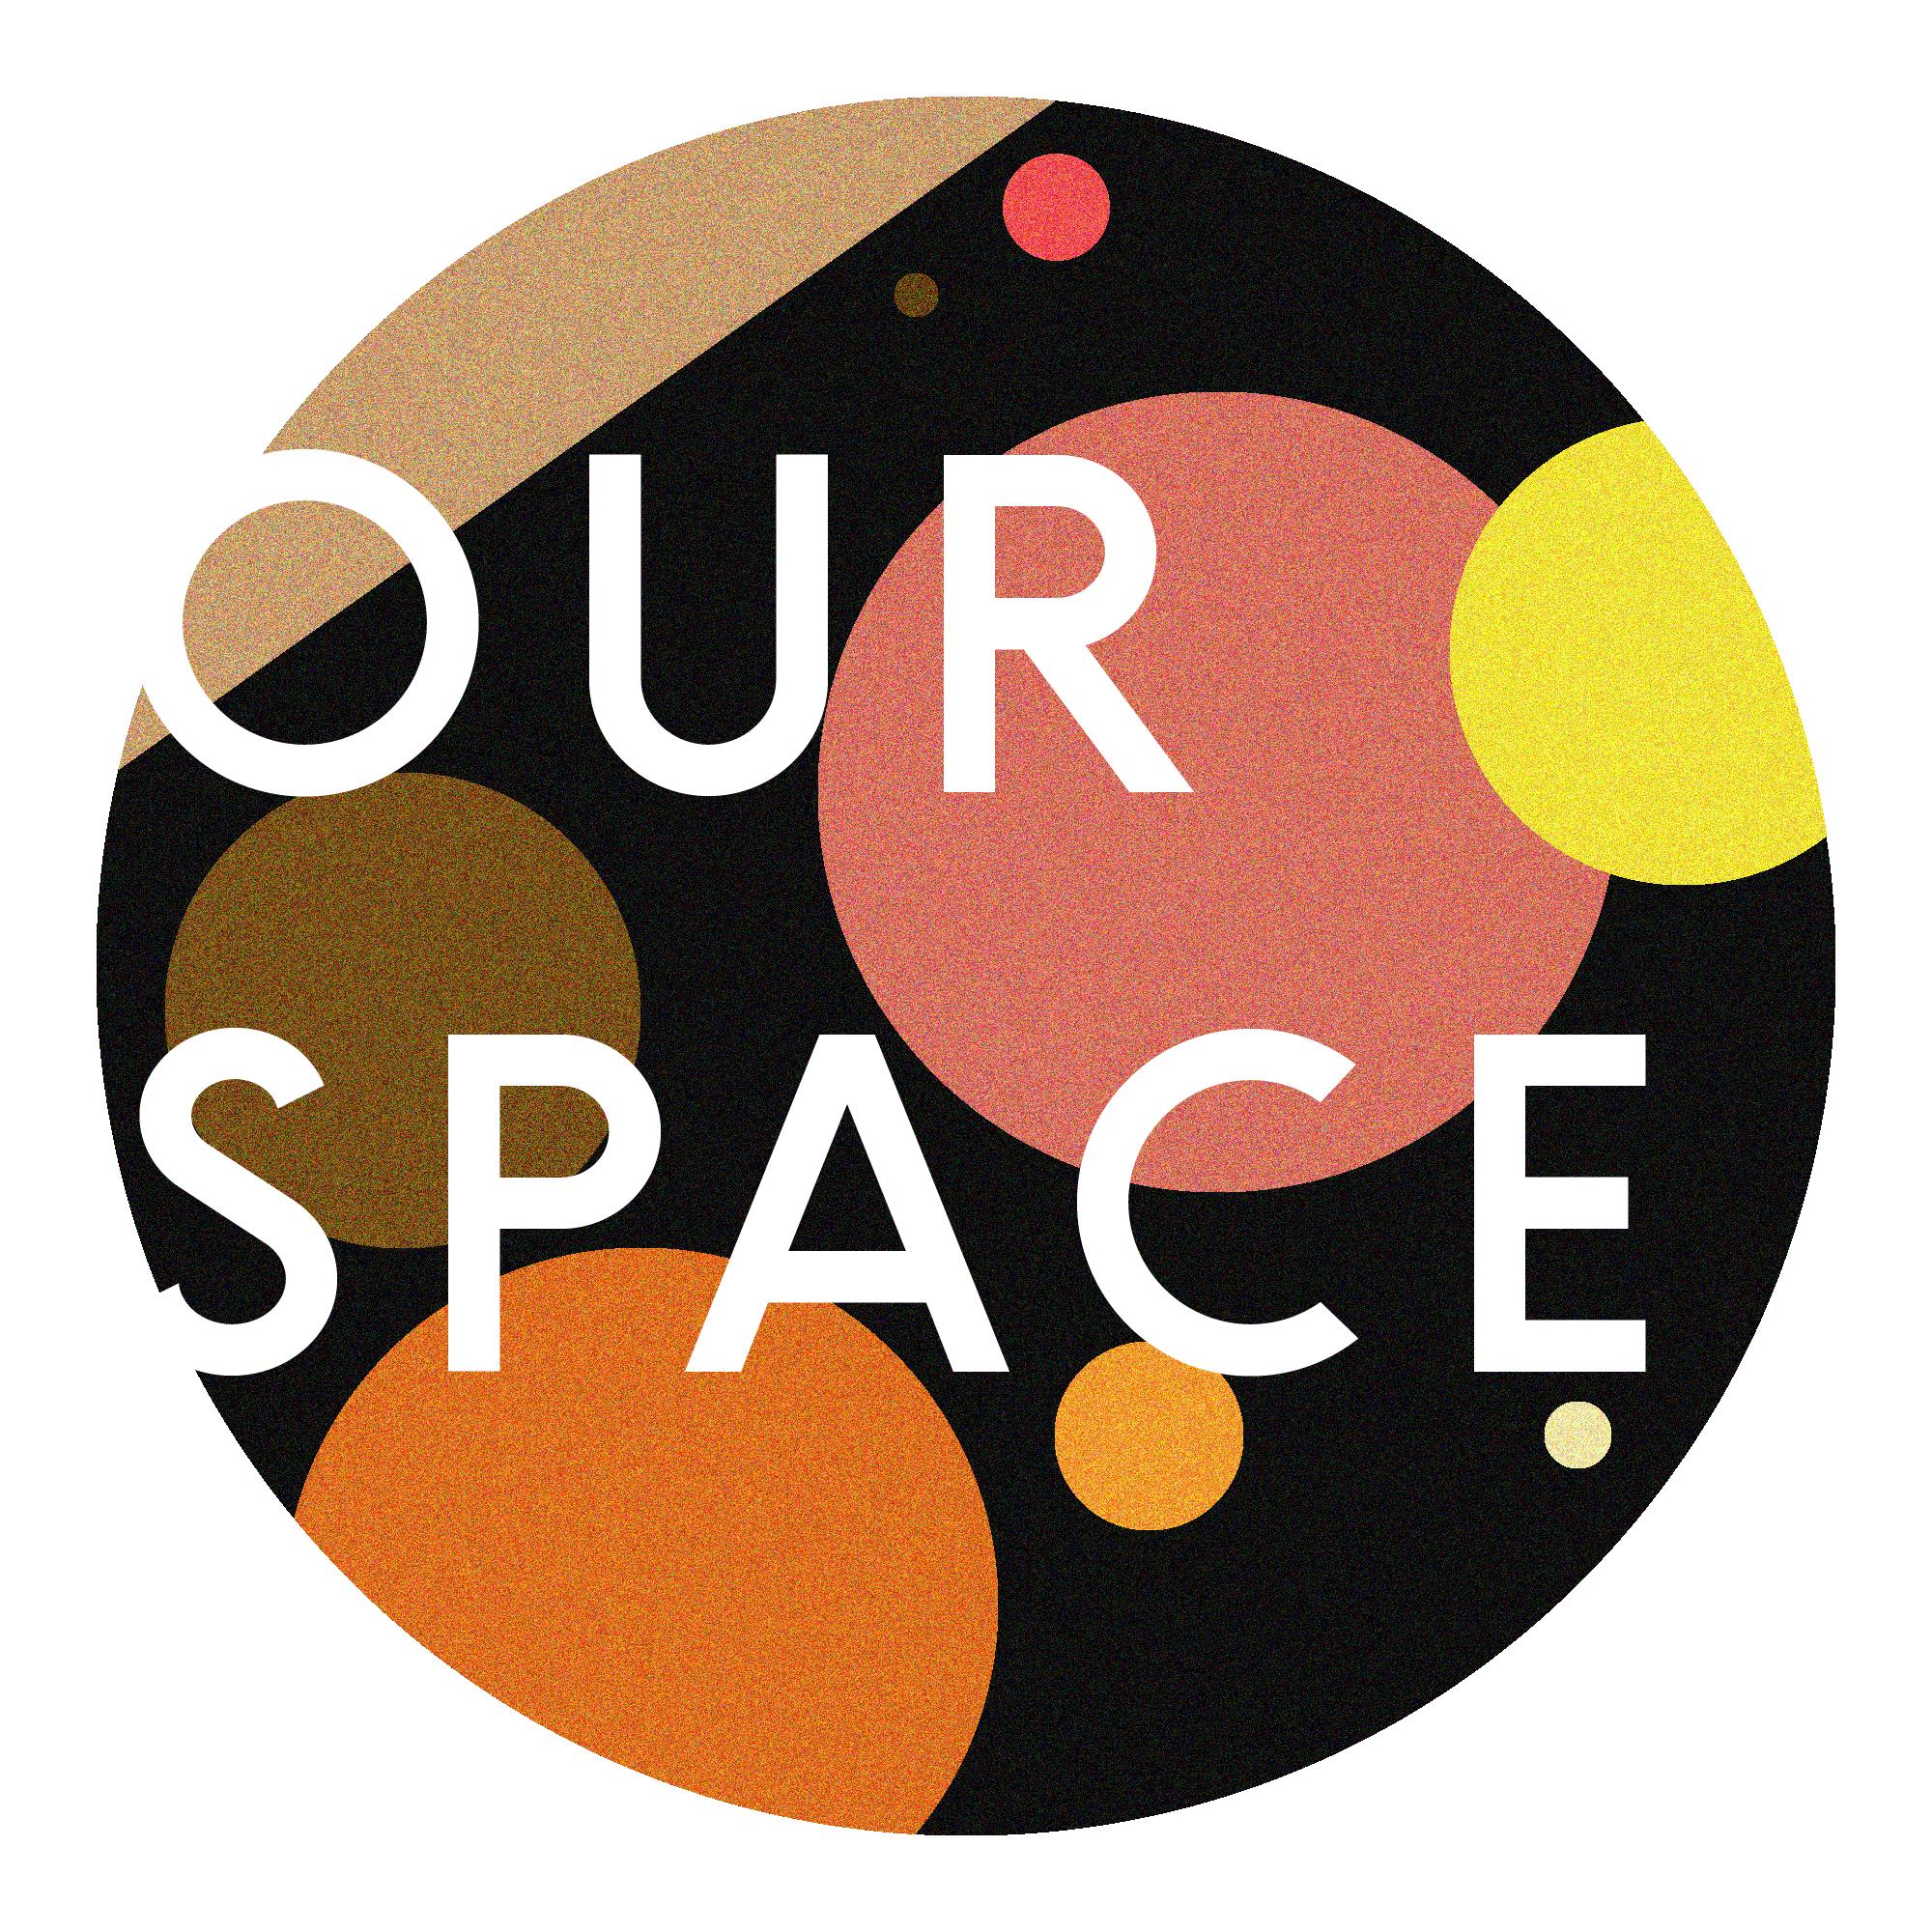 Silsiliad Gabay, an Our Space project